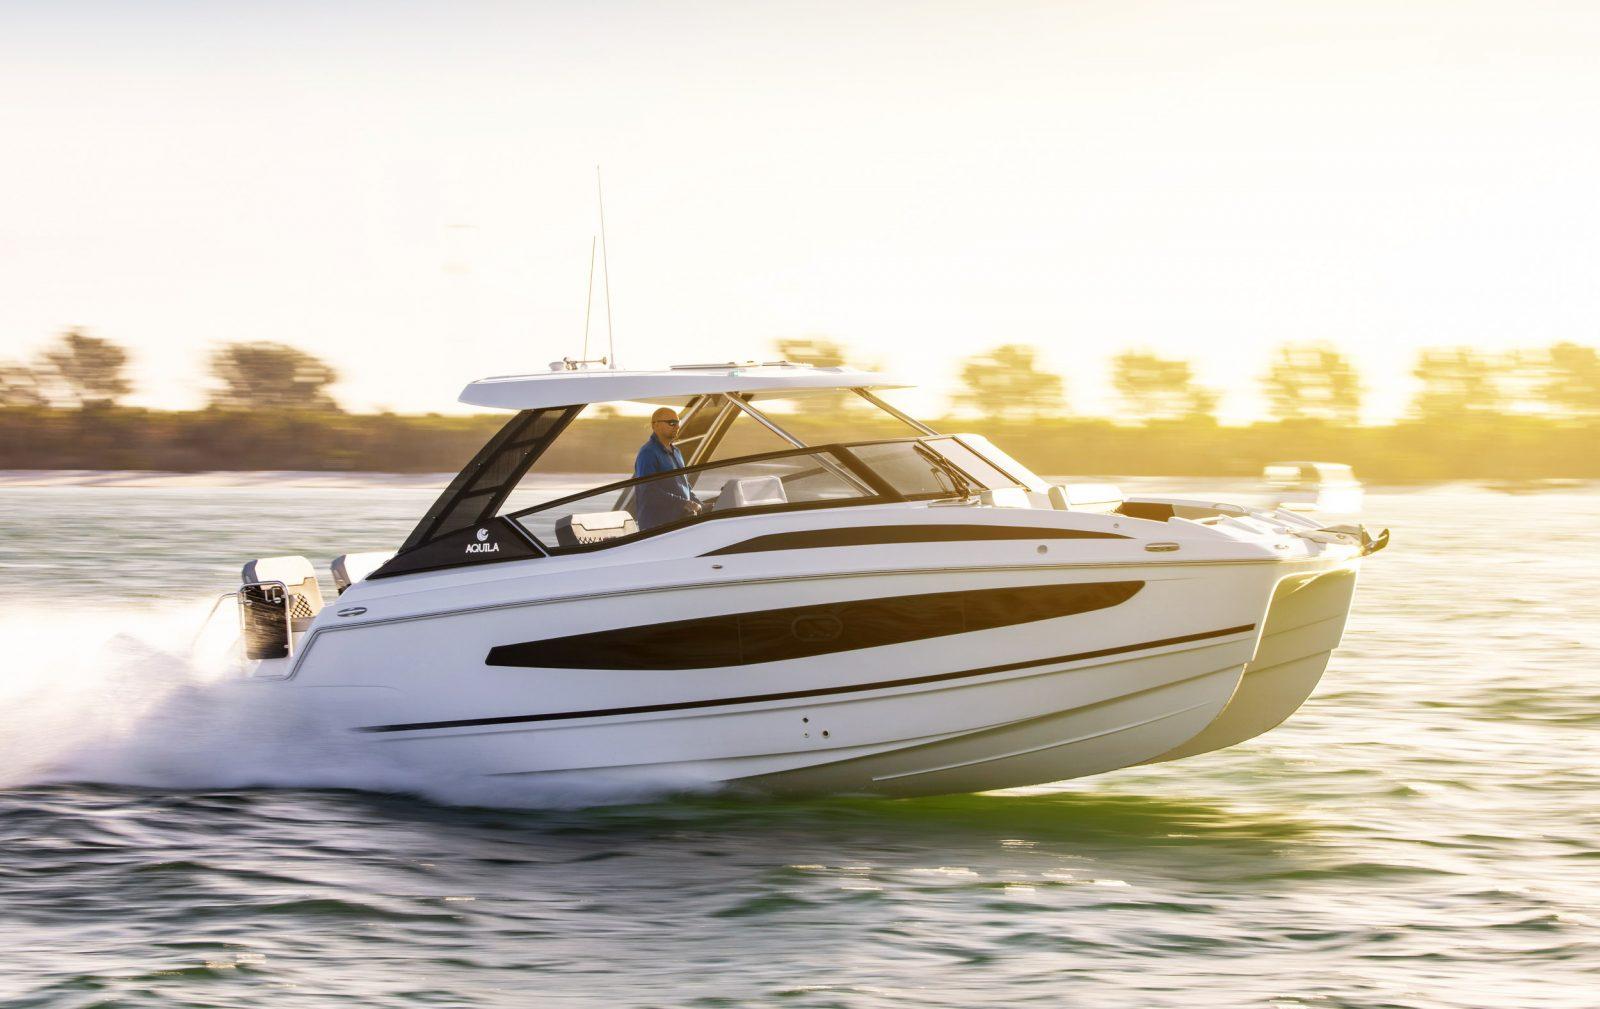 Simpson Marine - Aquila 32S